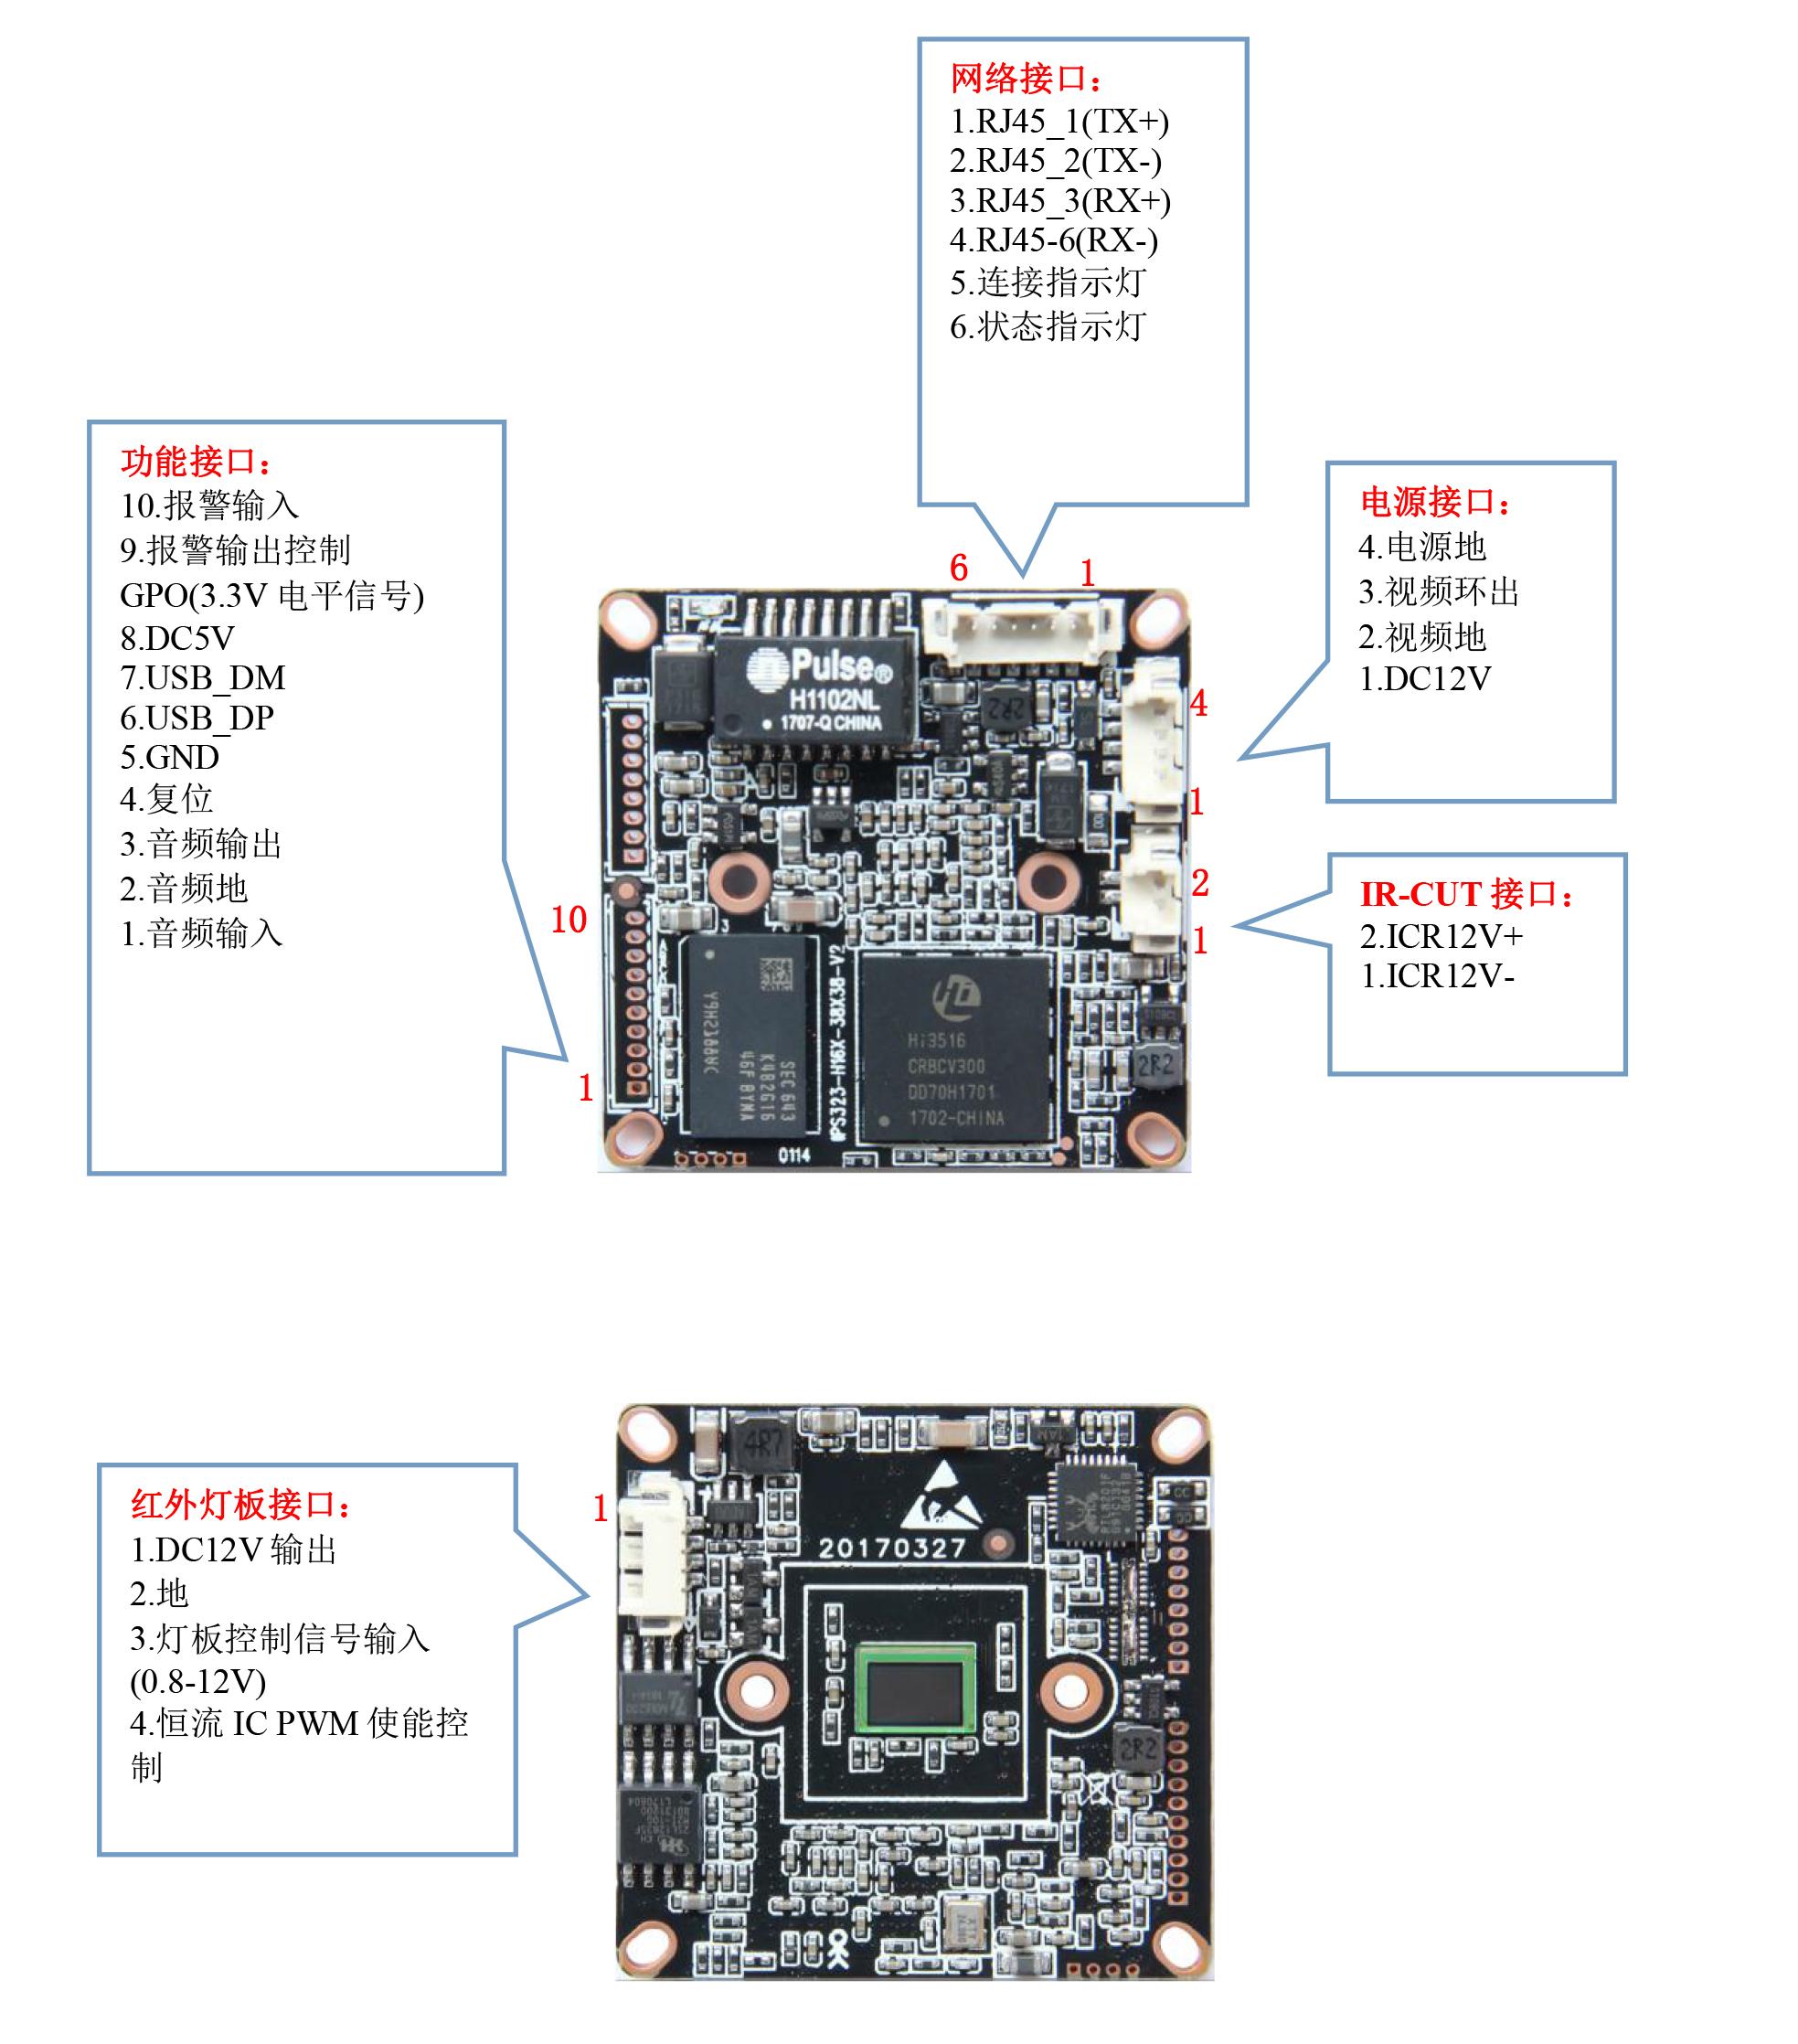 3516CV300-IMX323_规格书-new-资料内容-2